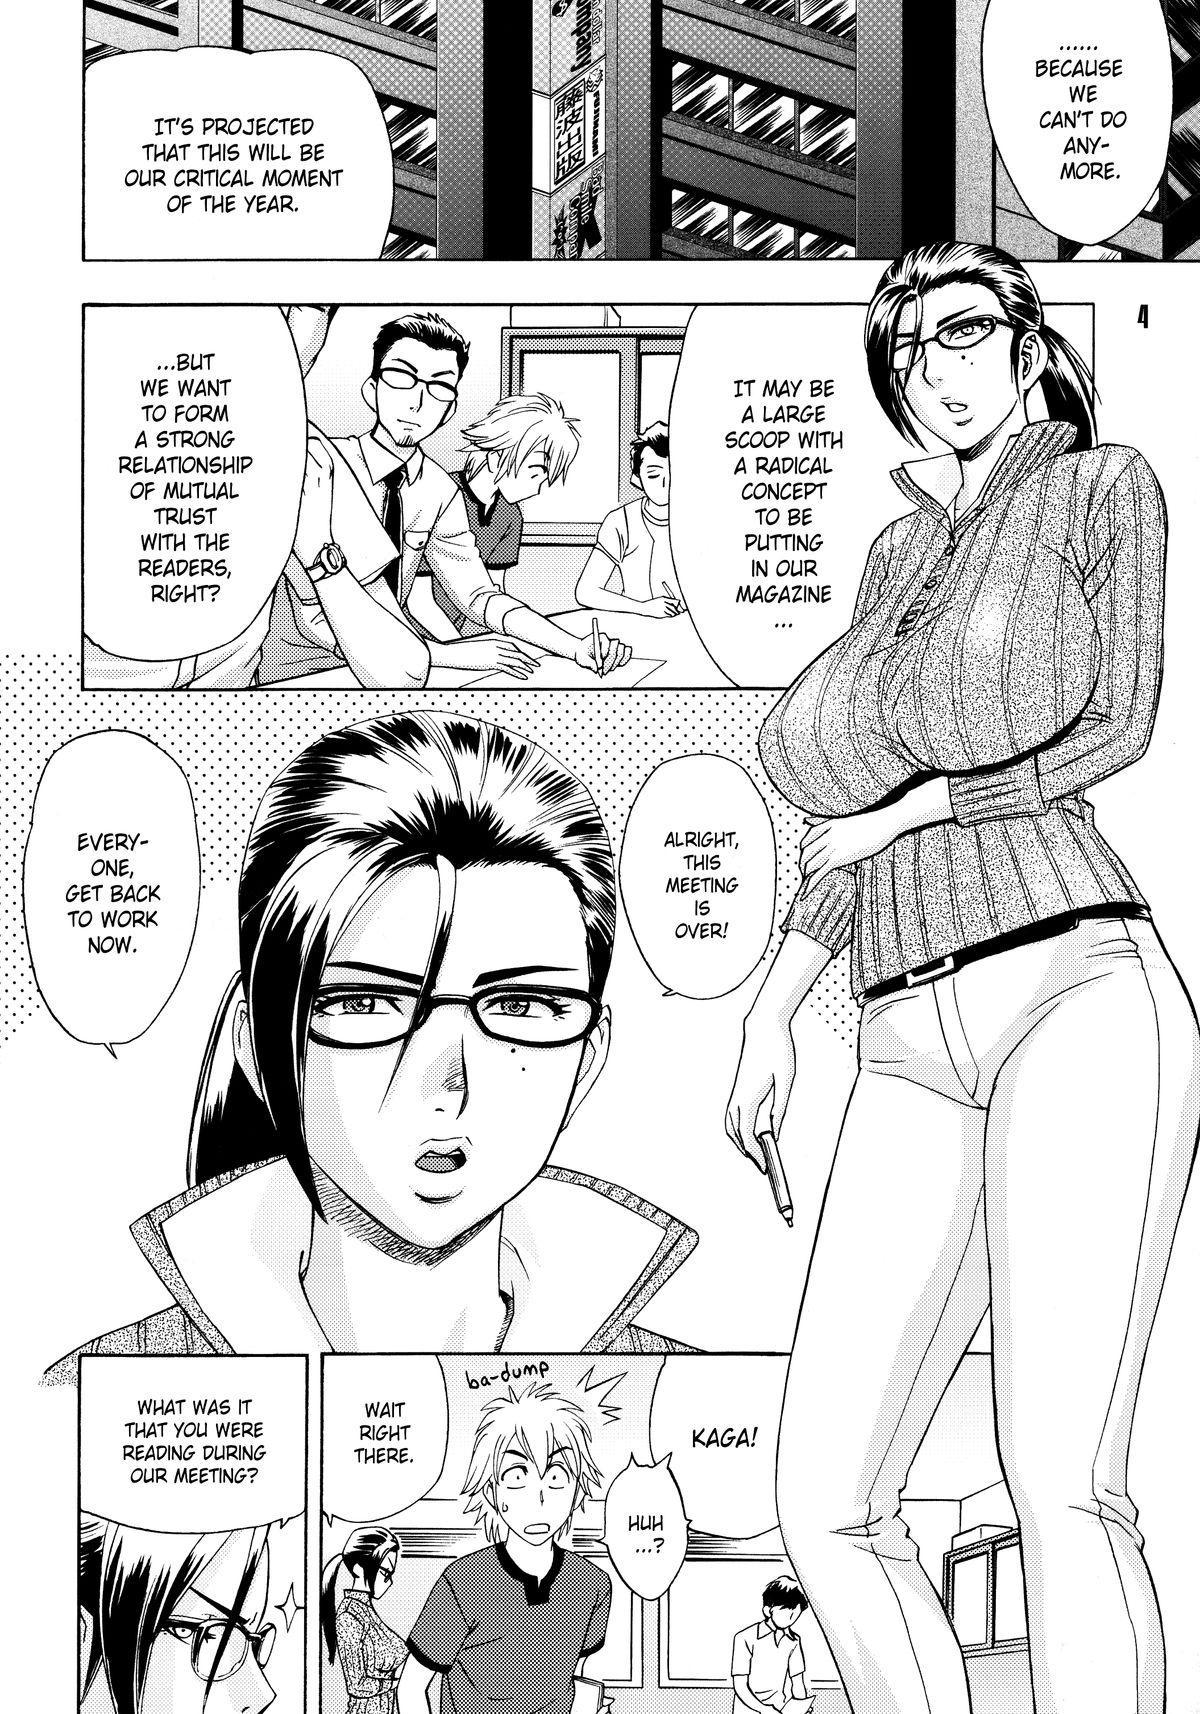 [Madam Project (Tatsunami Youtoku)] Bijin Henshuu-chou no Himitsu (1)   Beautiful Editor-in-Chief's Secret (1) [English] [Forbiddenfetish77] [Decensored] 3